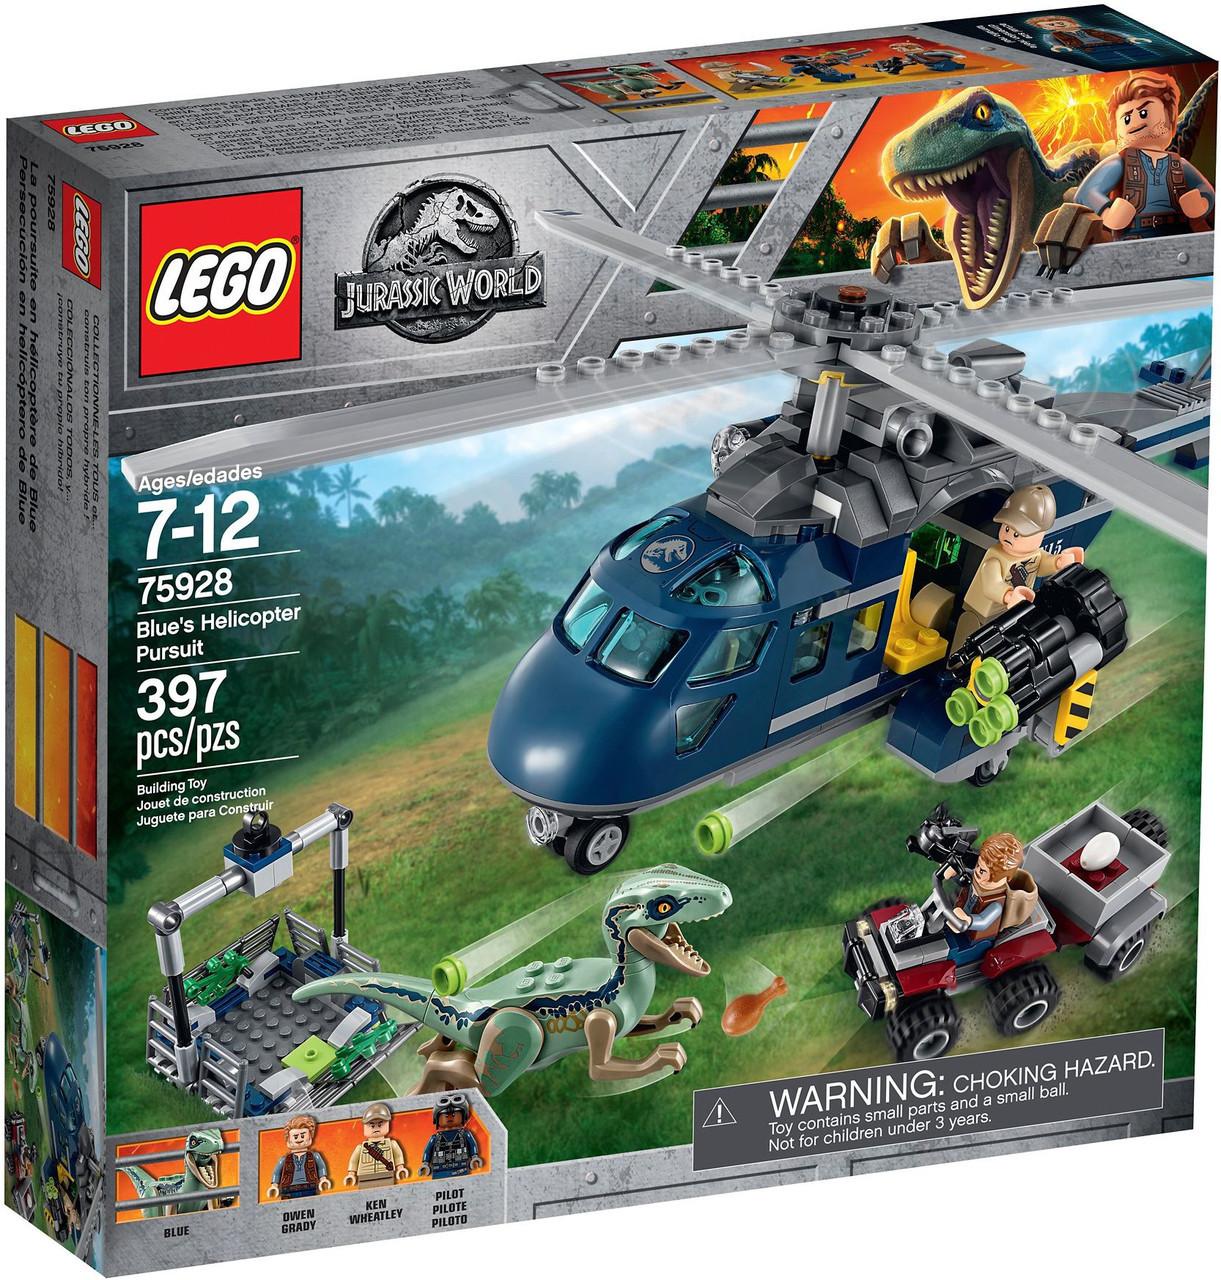 Детский Конструктор Lego Jurassic World Погоня за Блю на вертолёте 75928